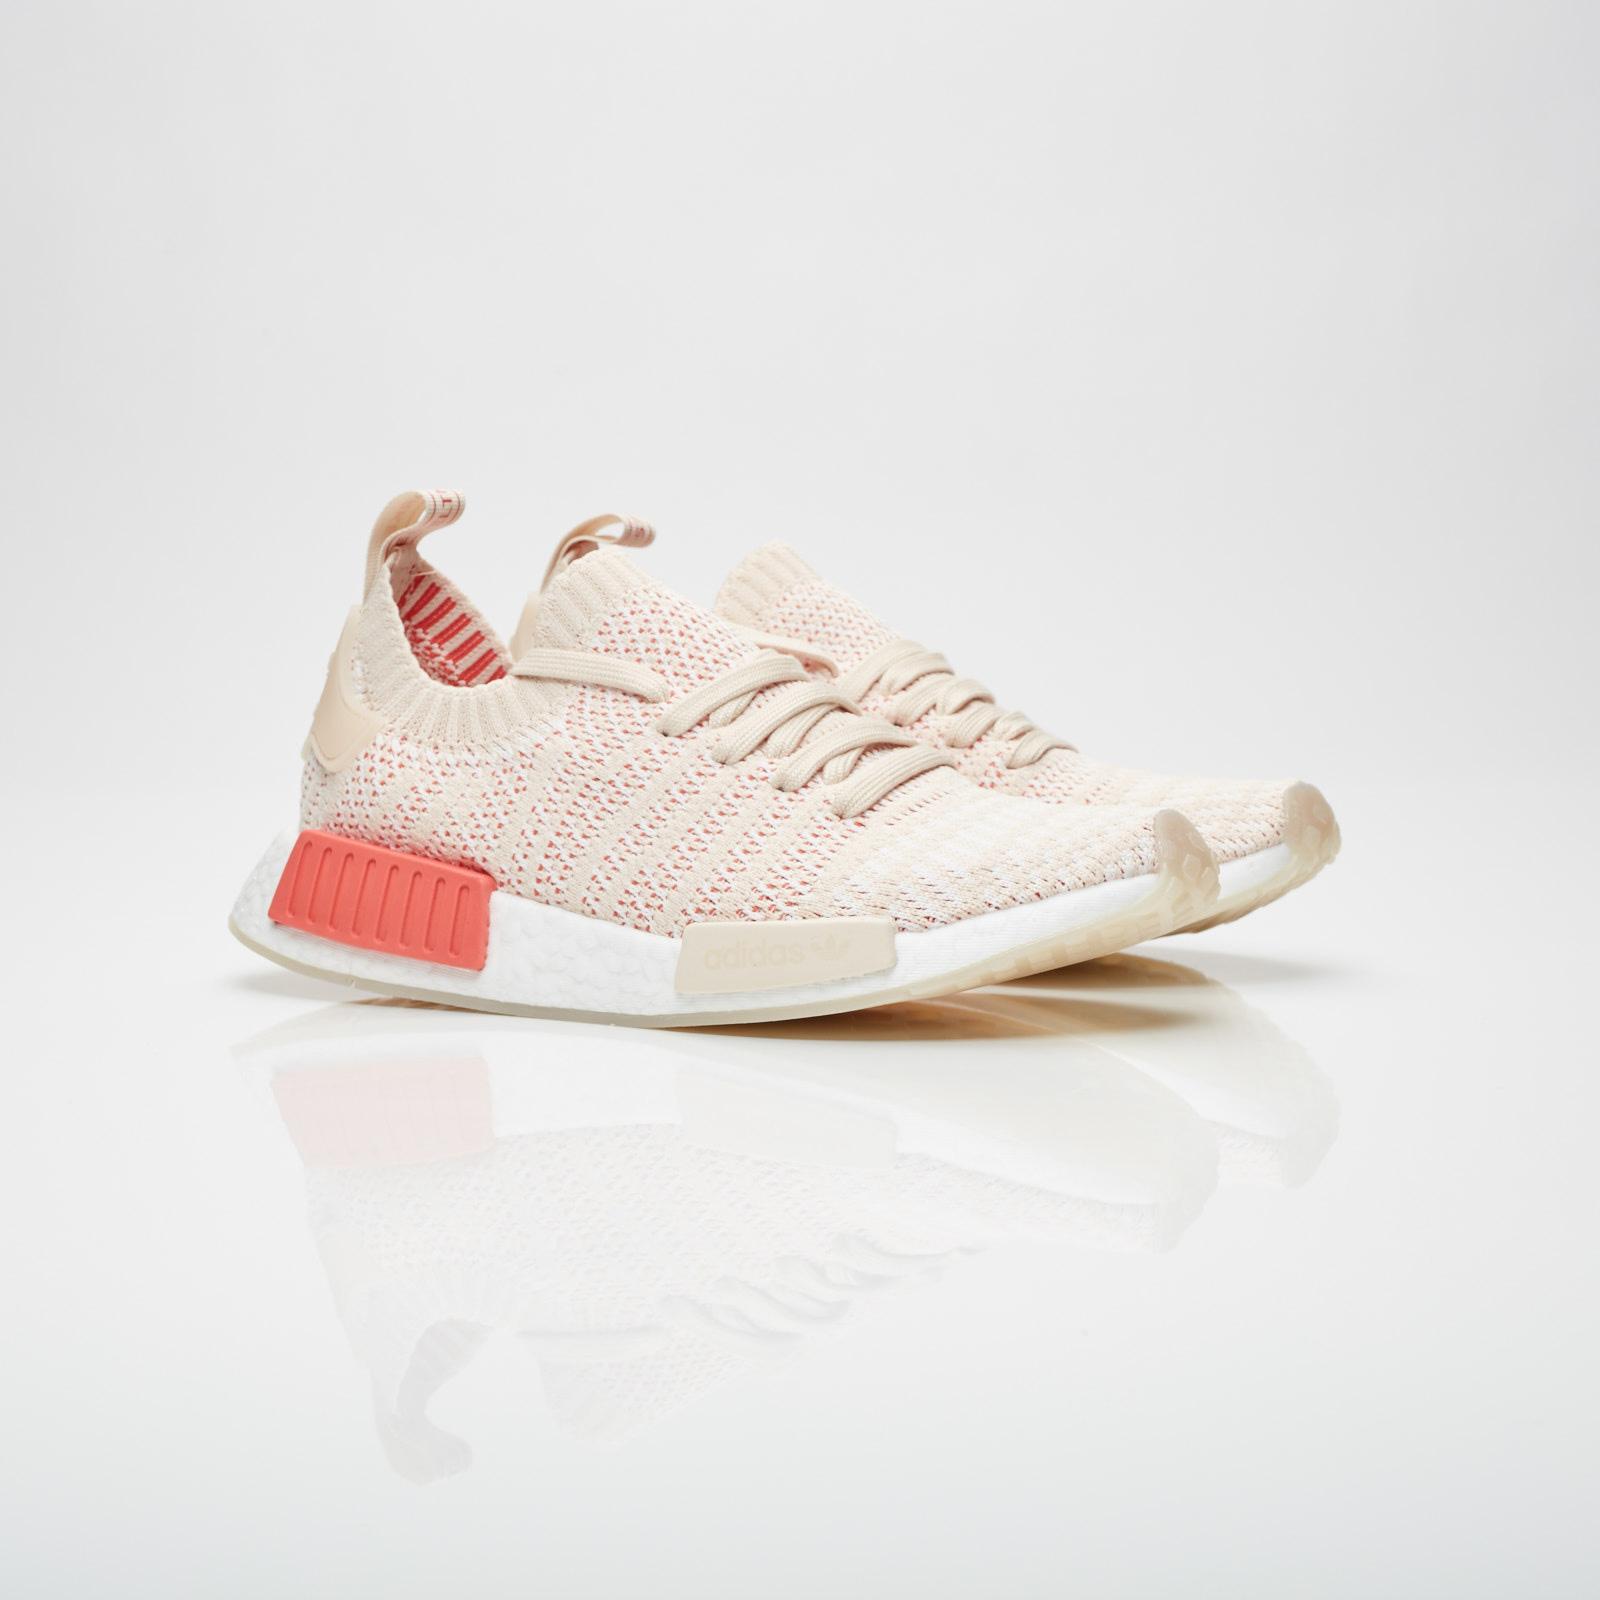 wholesale dealer e54b6 a7b2f adidas NMD R1 Stlt PK W - Cq2030 - Sneakersnstuff | sneakers ...